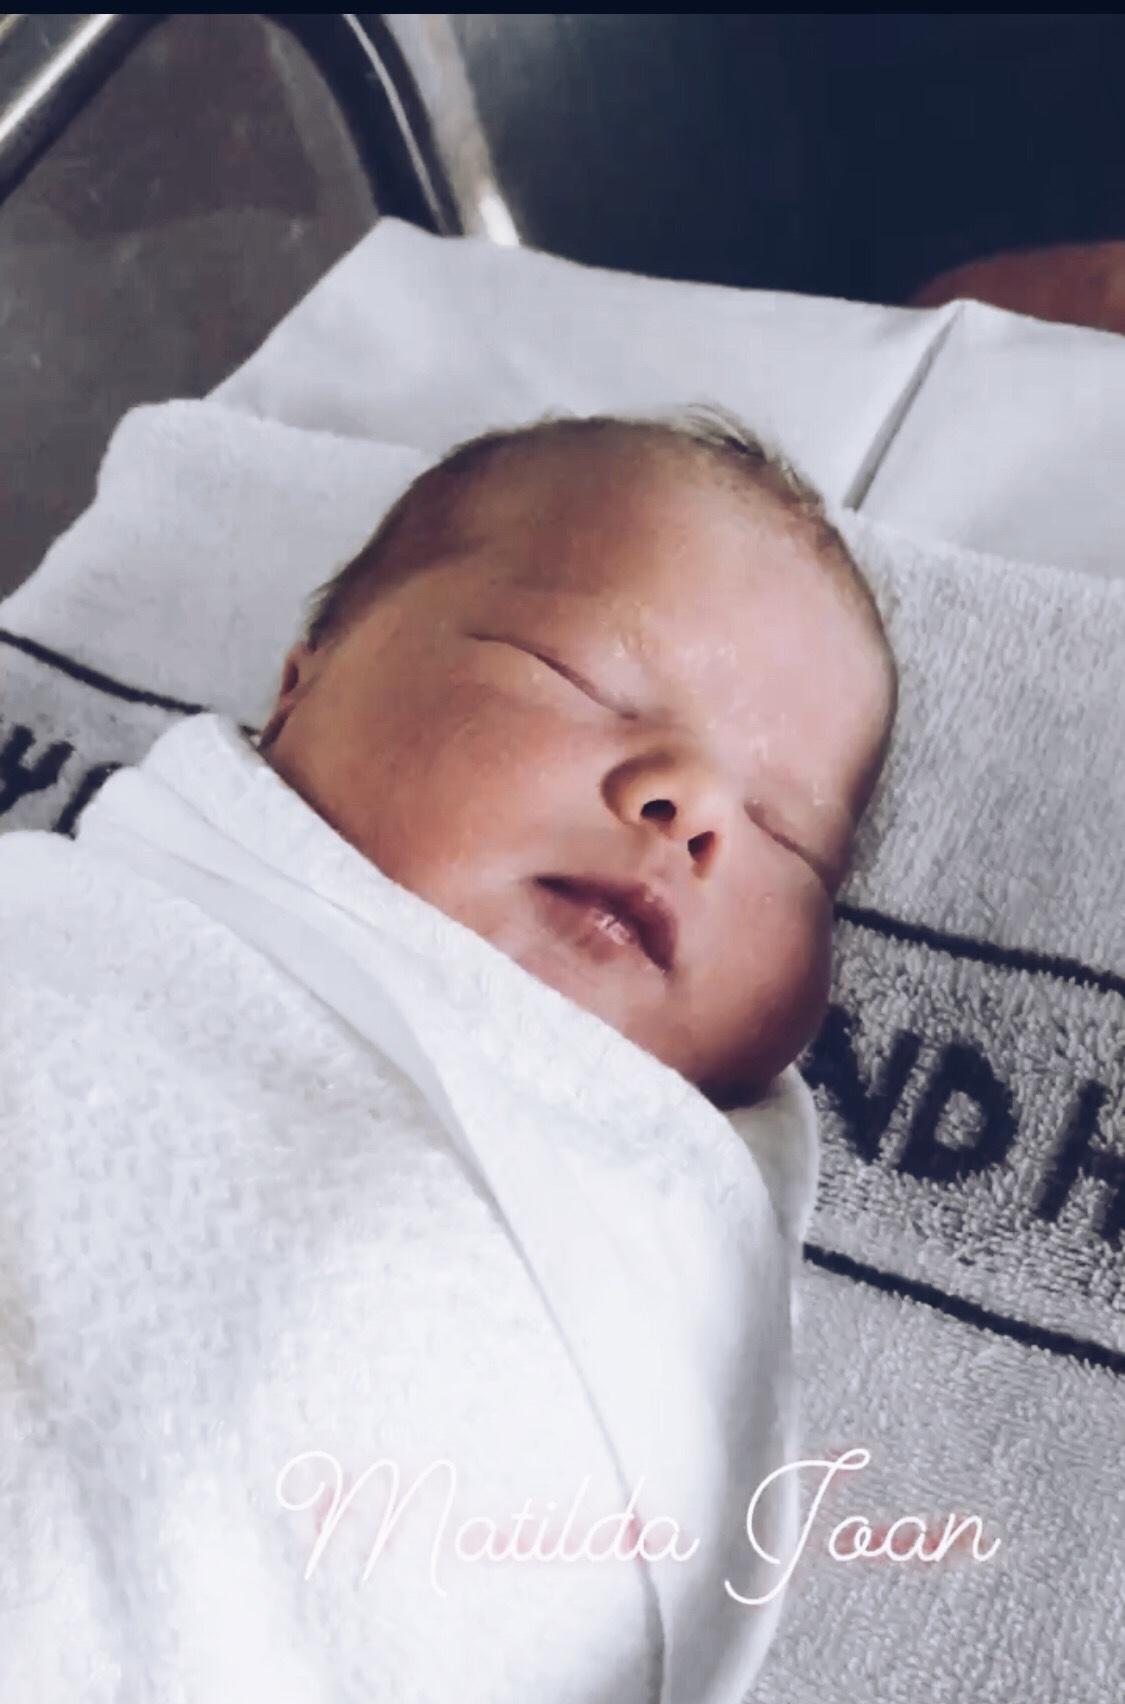 Matilda Joan: My Second Natural ChildbirthStory